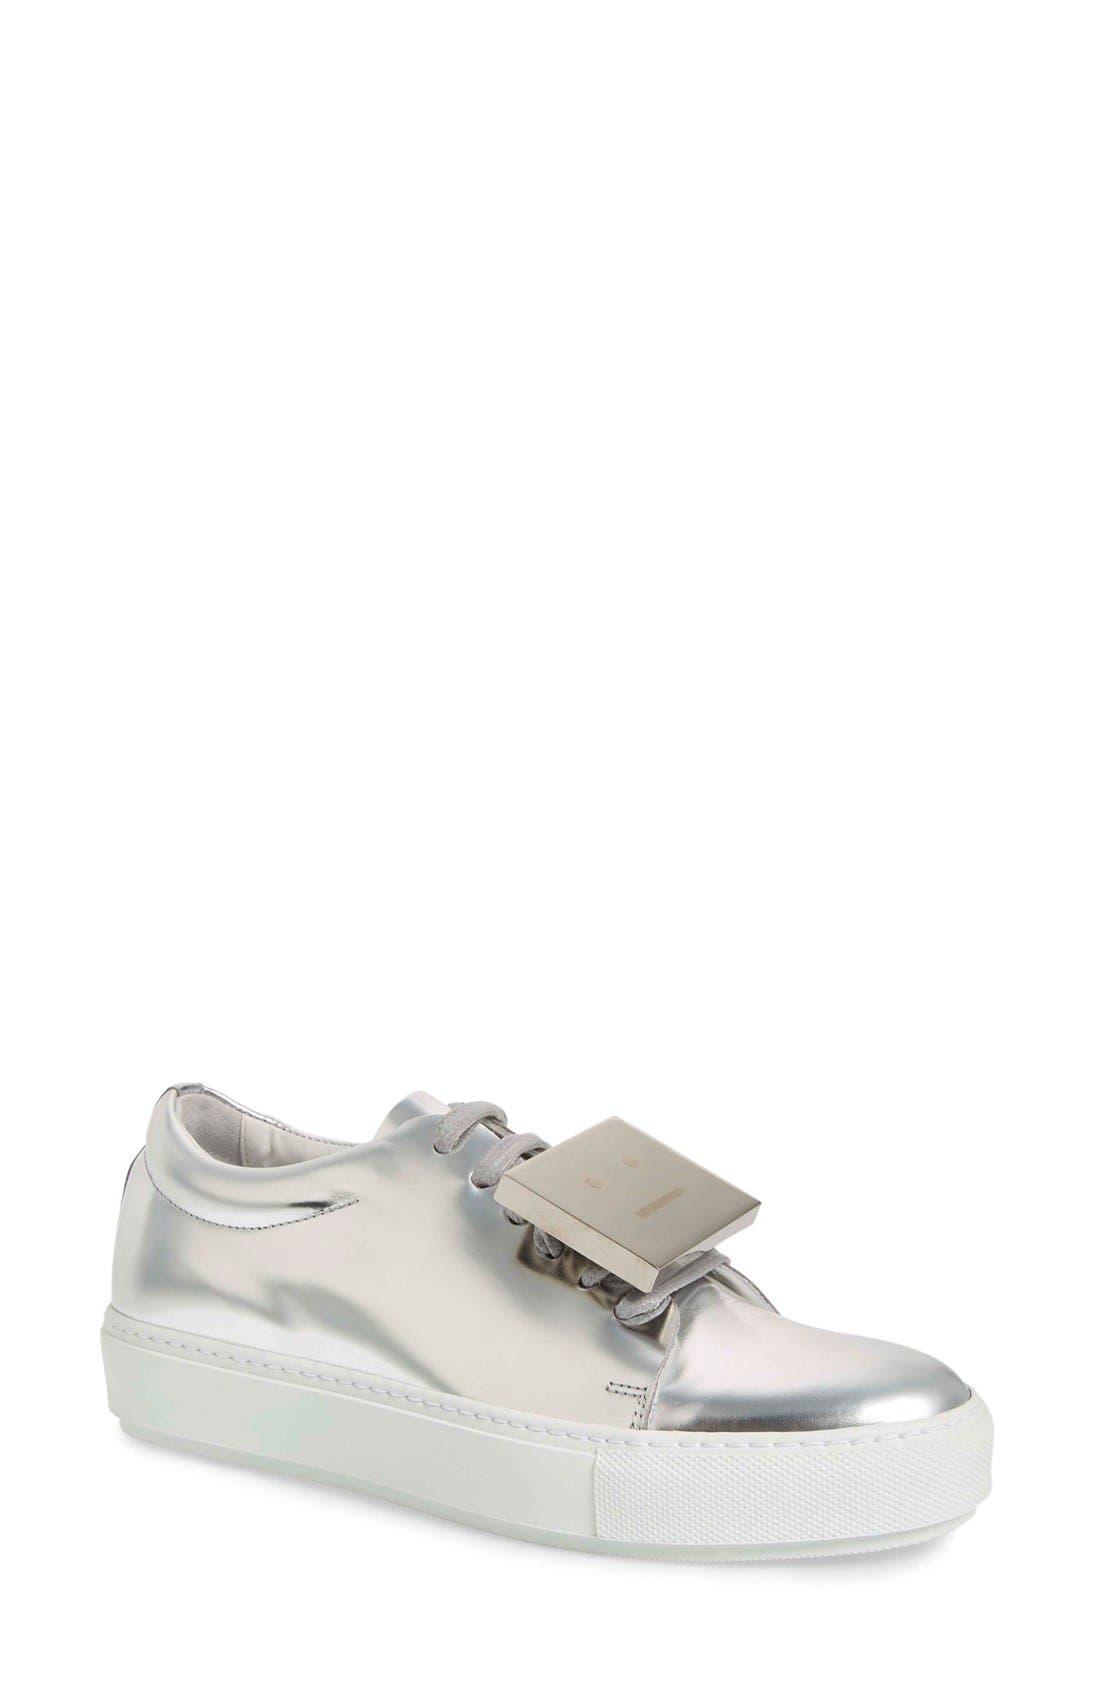 ACNE Studios 'Adriana' Silver Metallic Sneaker (Women)